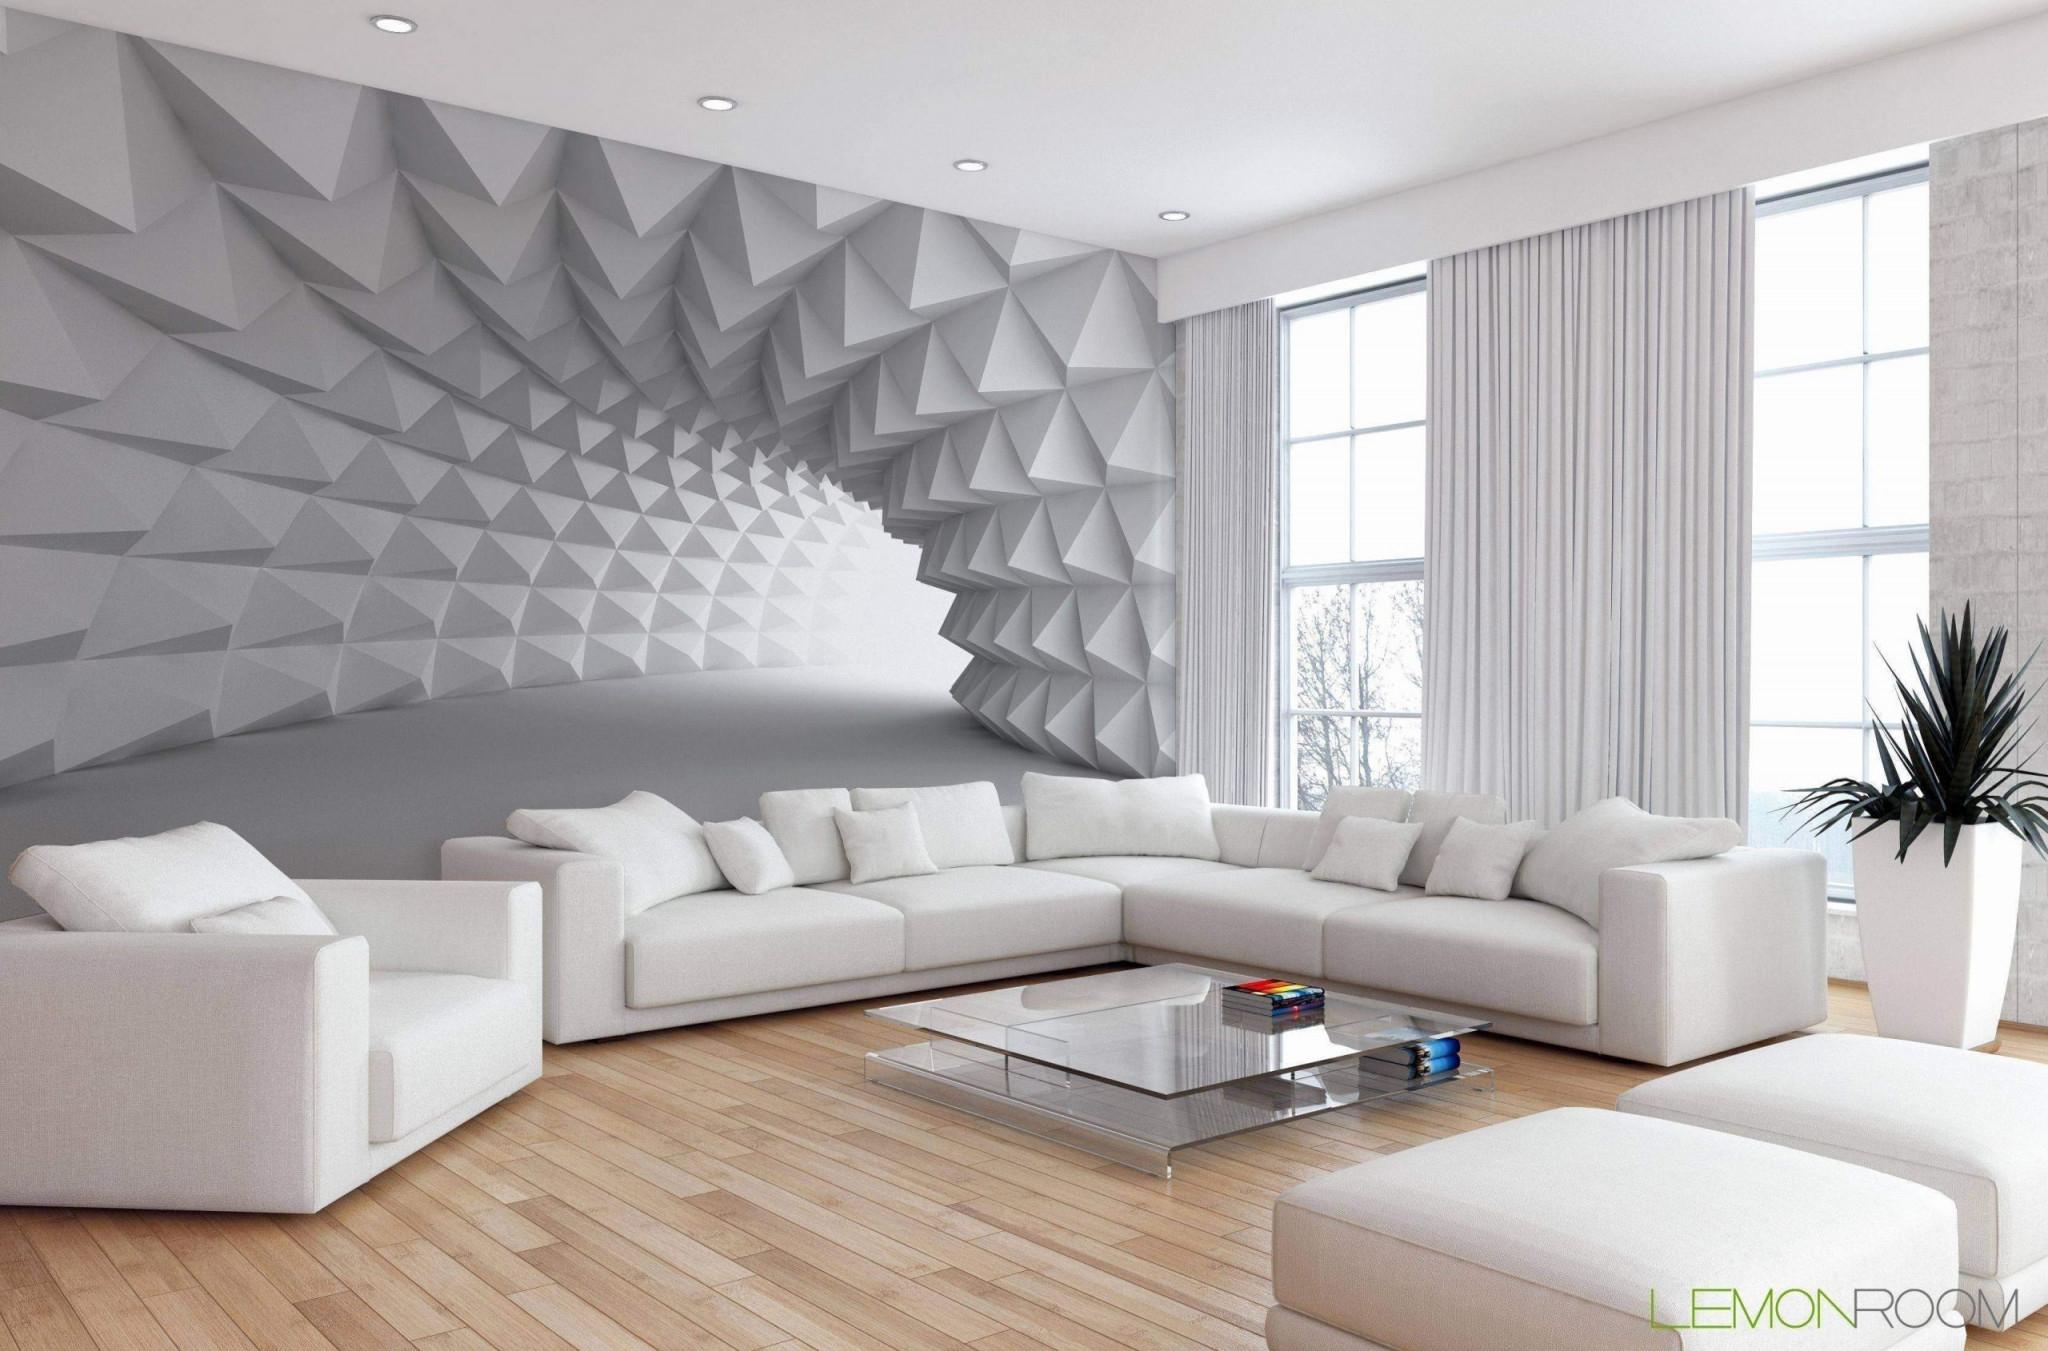 Tapeten Ideen Wohnzimmer In 2020  Design Living Room von Tapeten Ideen Wohnzimmer Bild